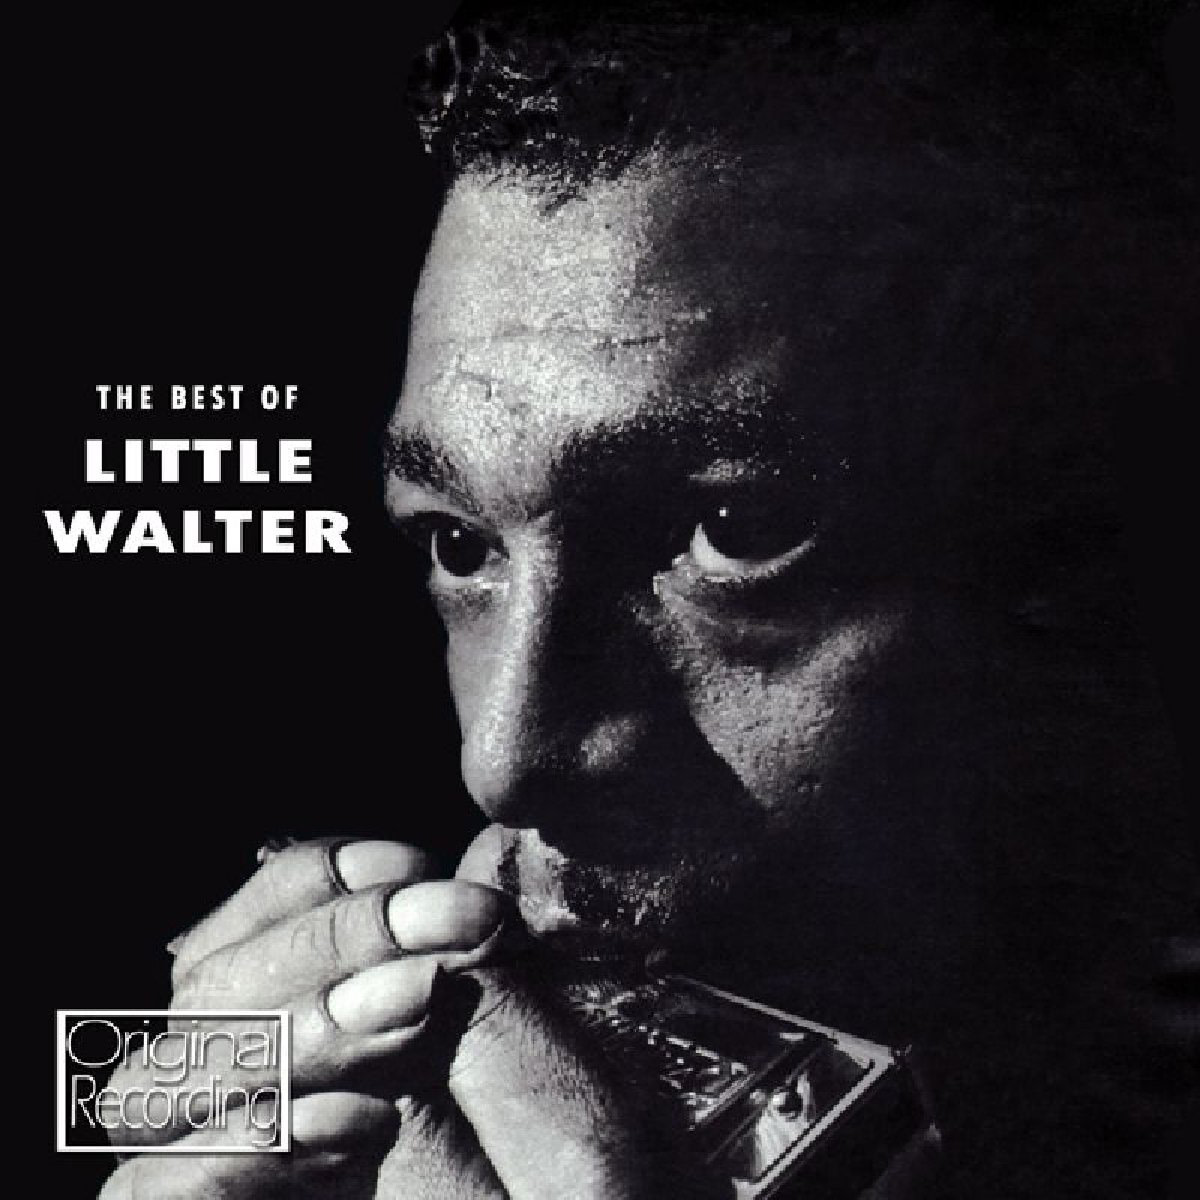 Little Walter, The Best of Little Walter